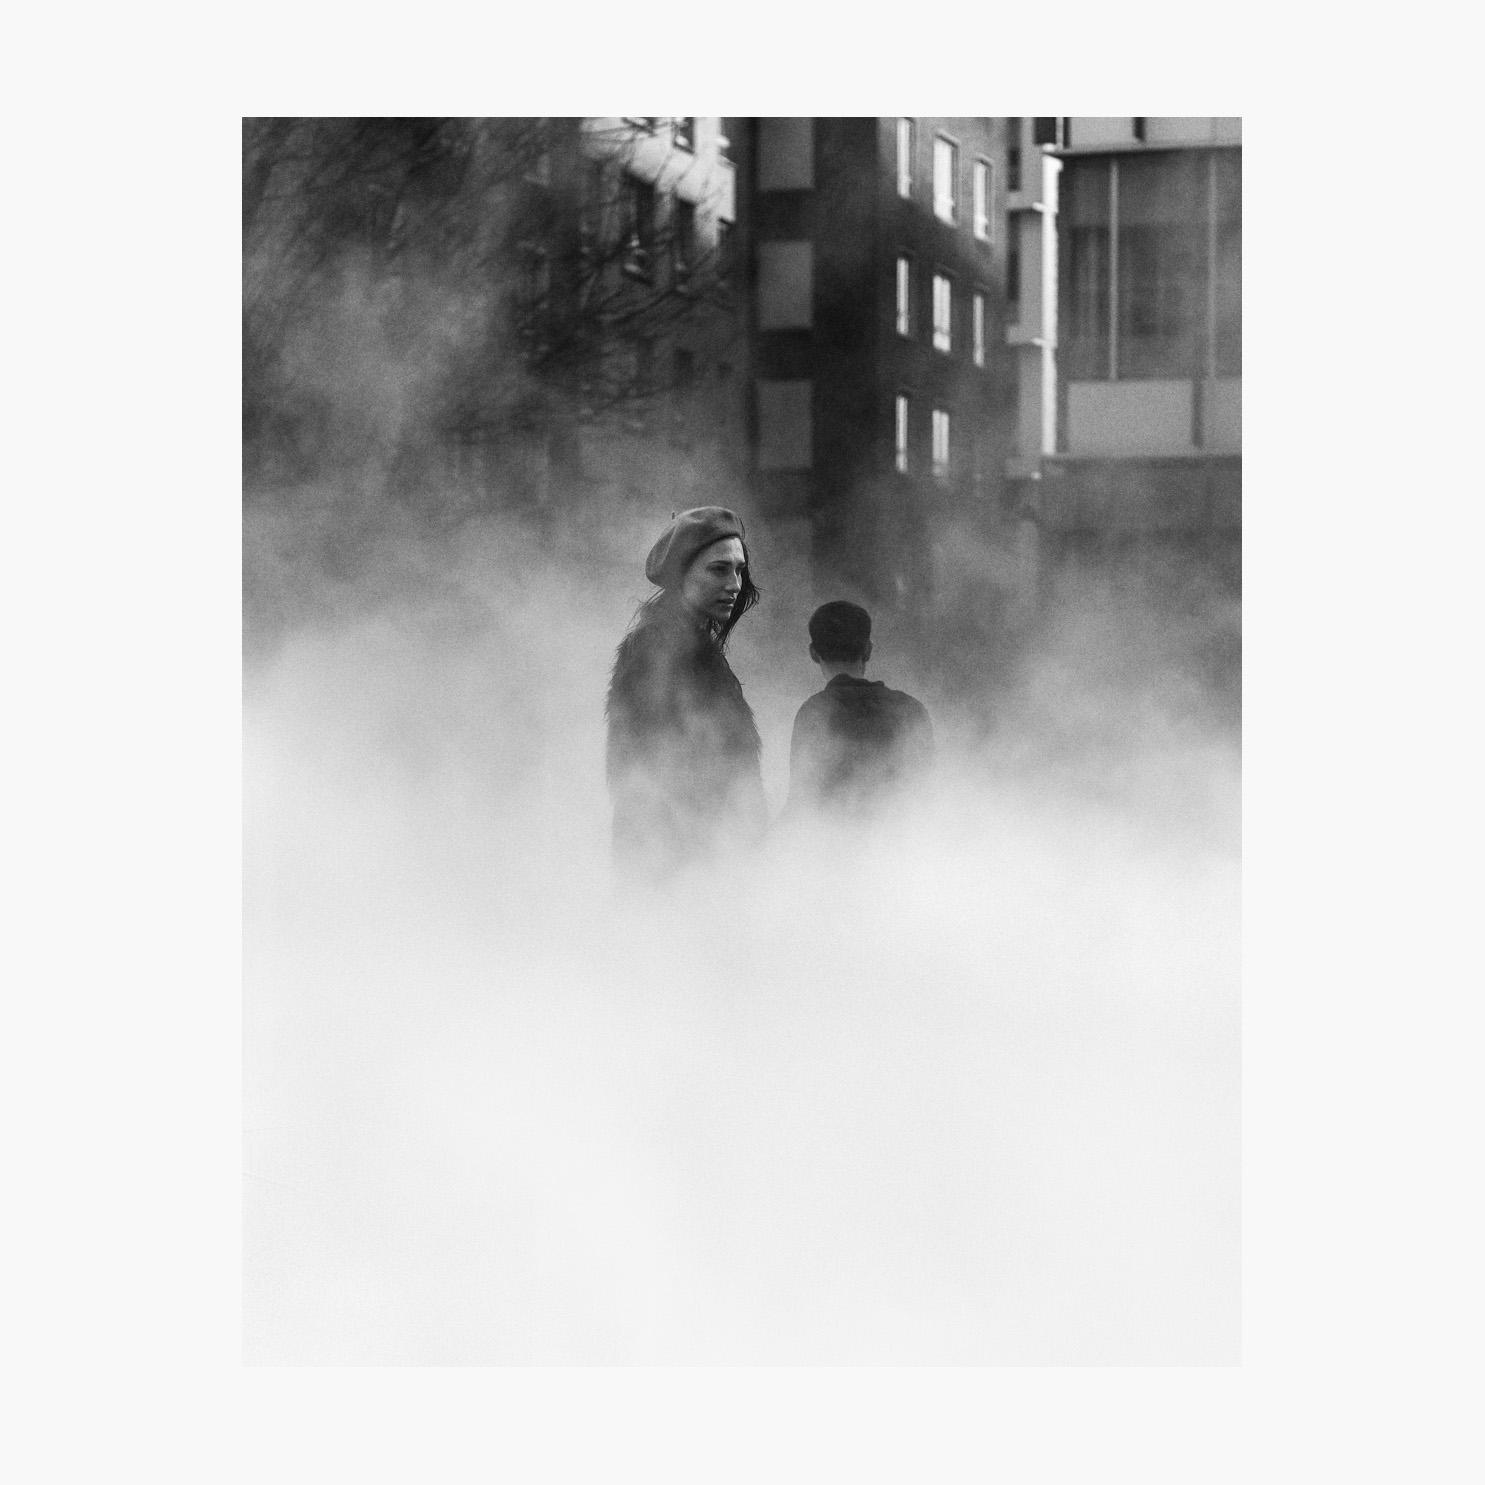 ©-Harry-W-Edmonds-2018-@photographersnote-Street-Sights-Social-PN07.jpg